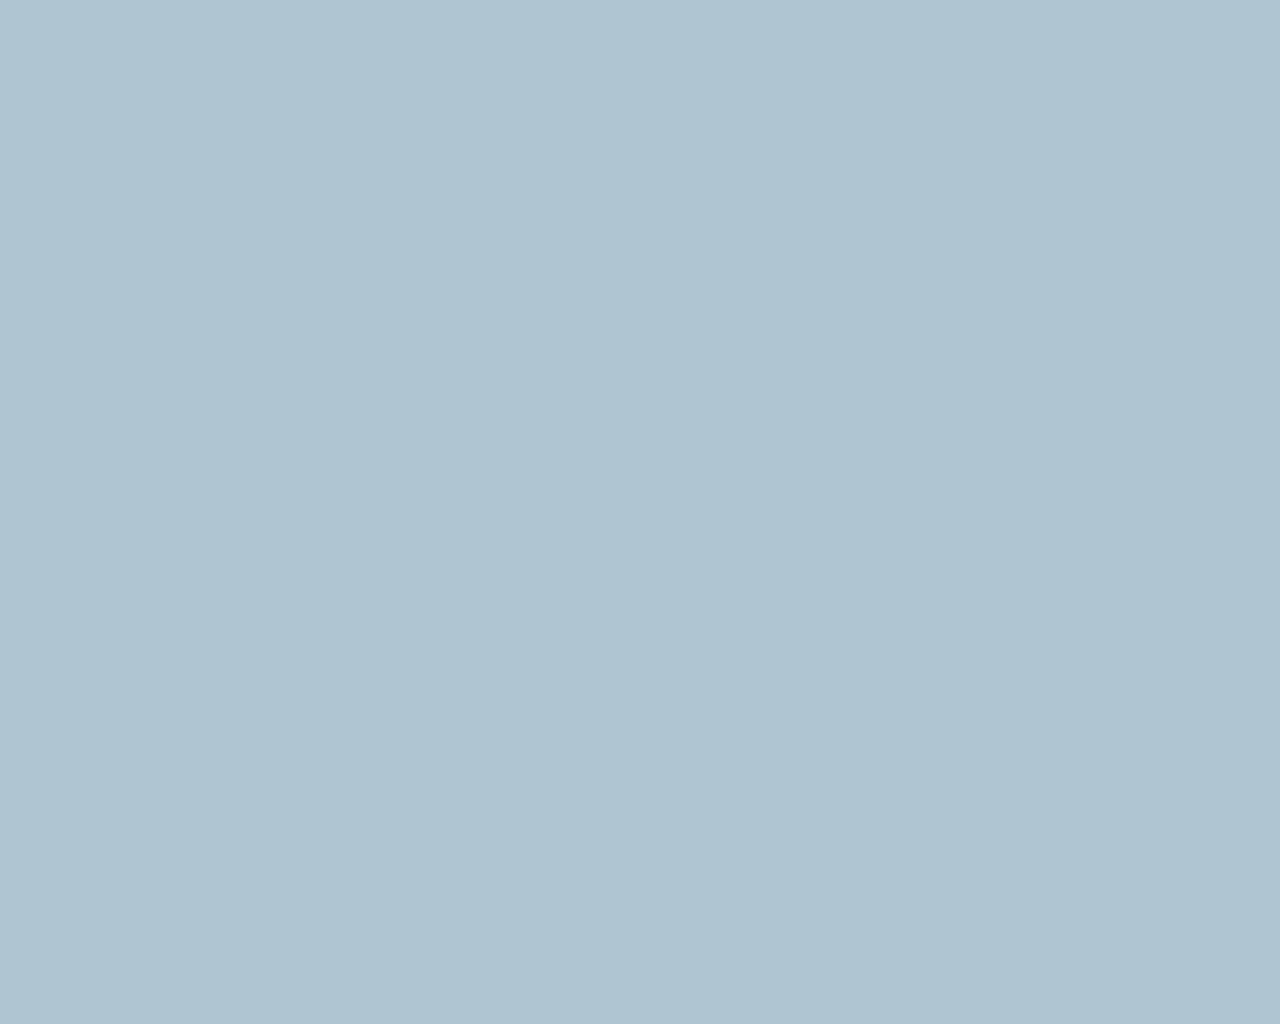 1280x1024 Pastel Blue Solid Color Background